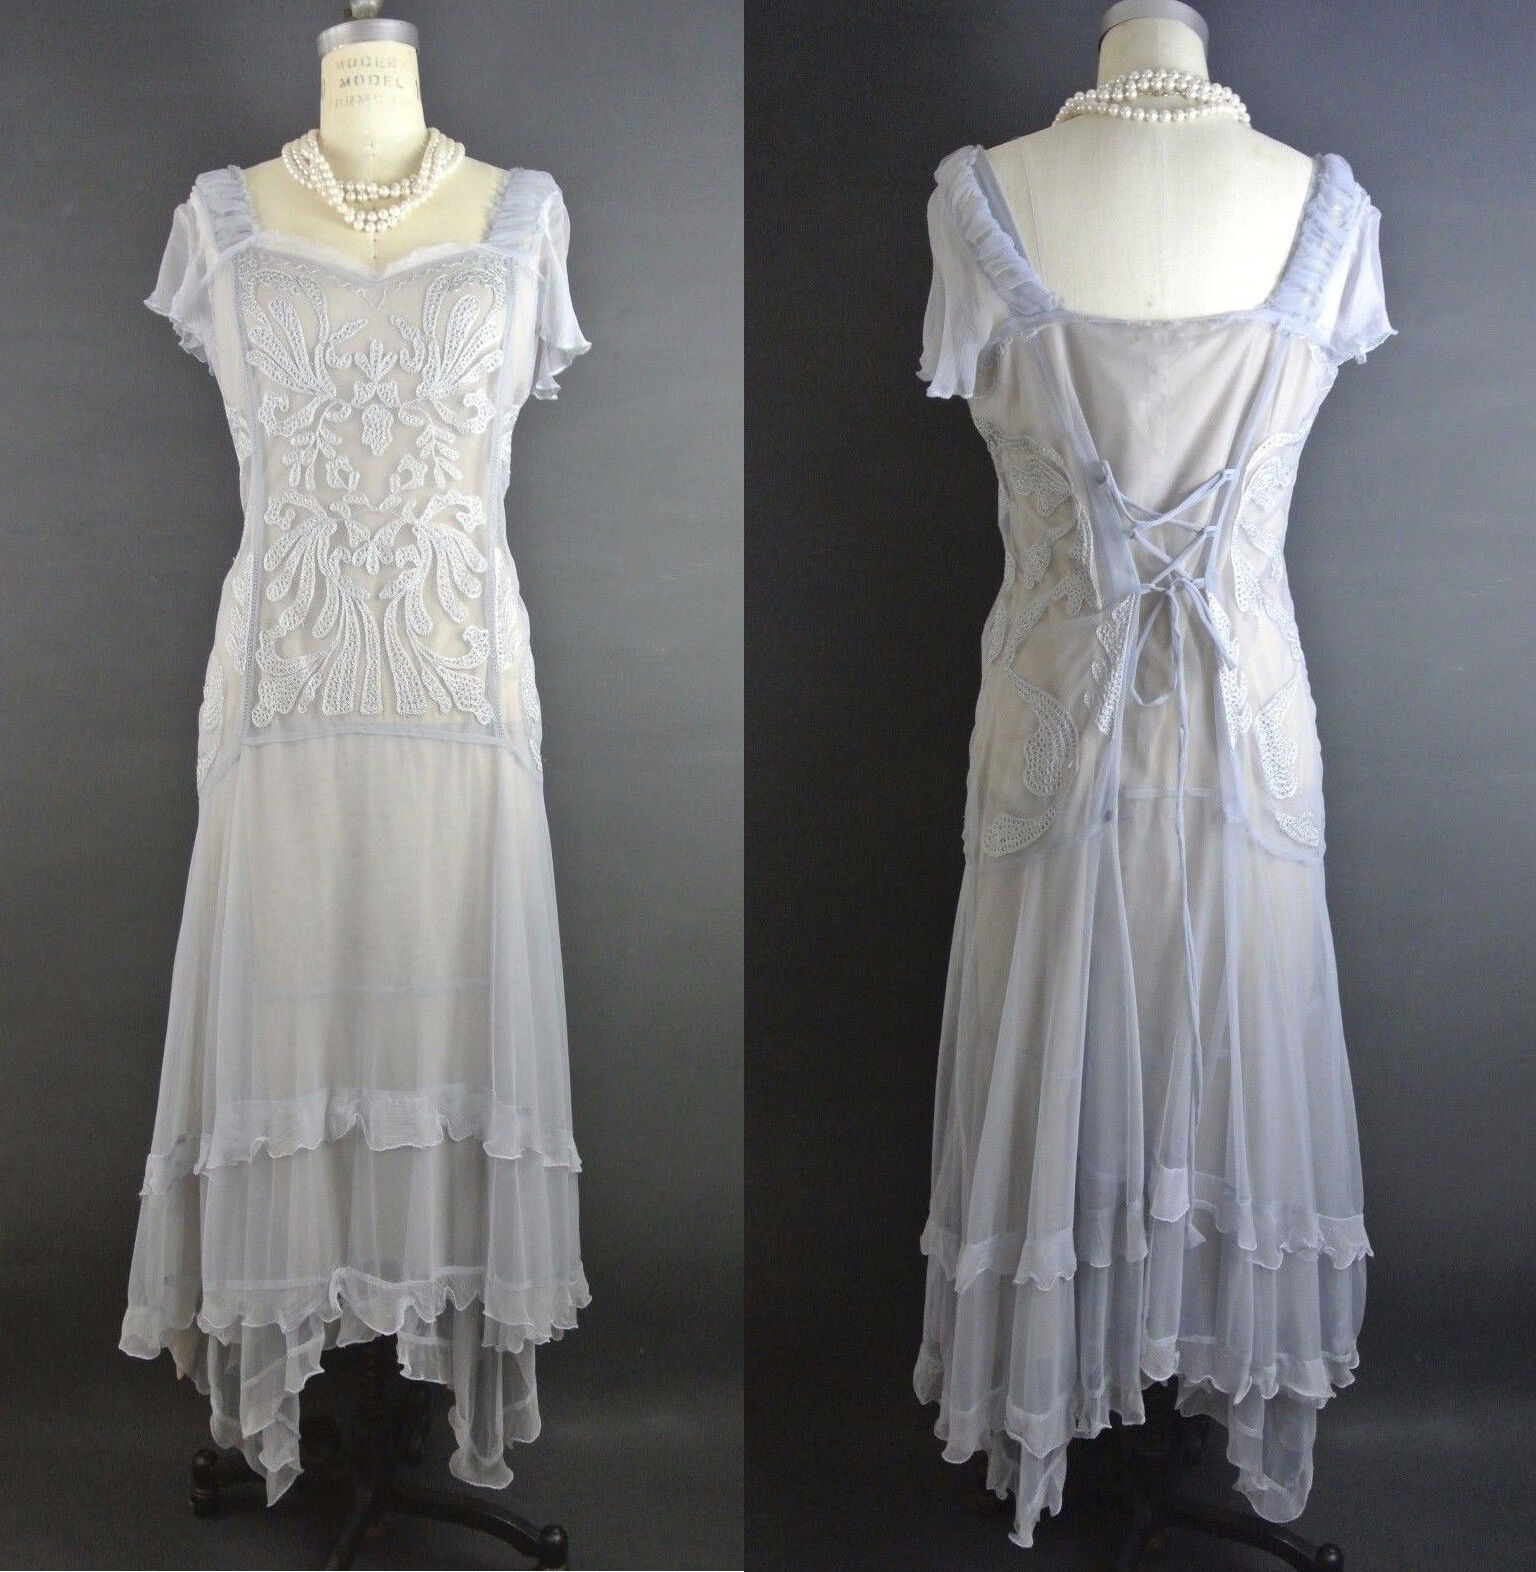 Gatsby Style Dress M Vintage Style Nataya Dress Sale 1920s inspired bluee NWT